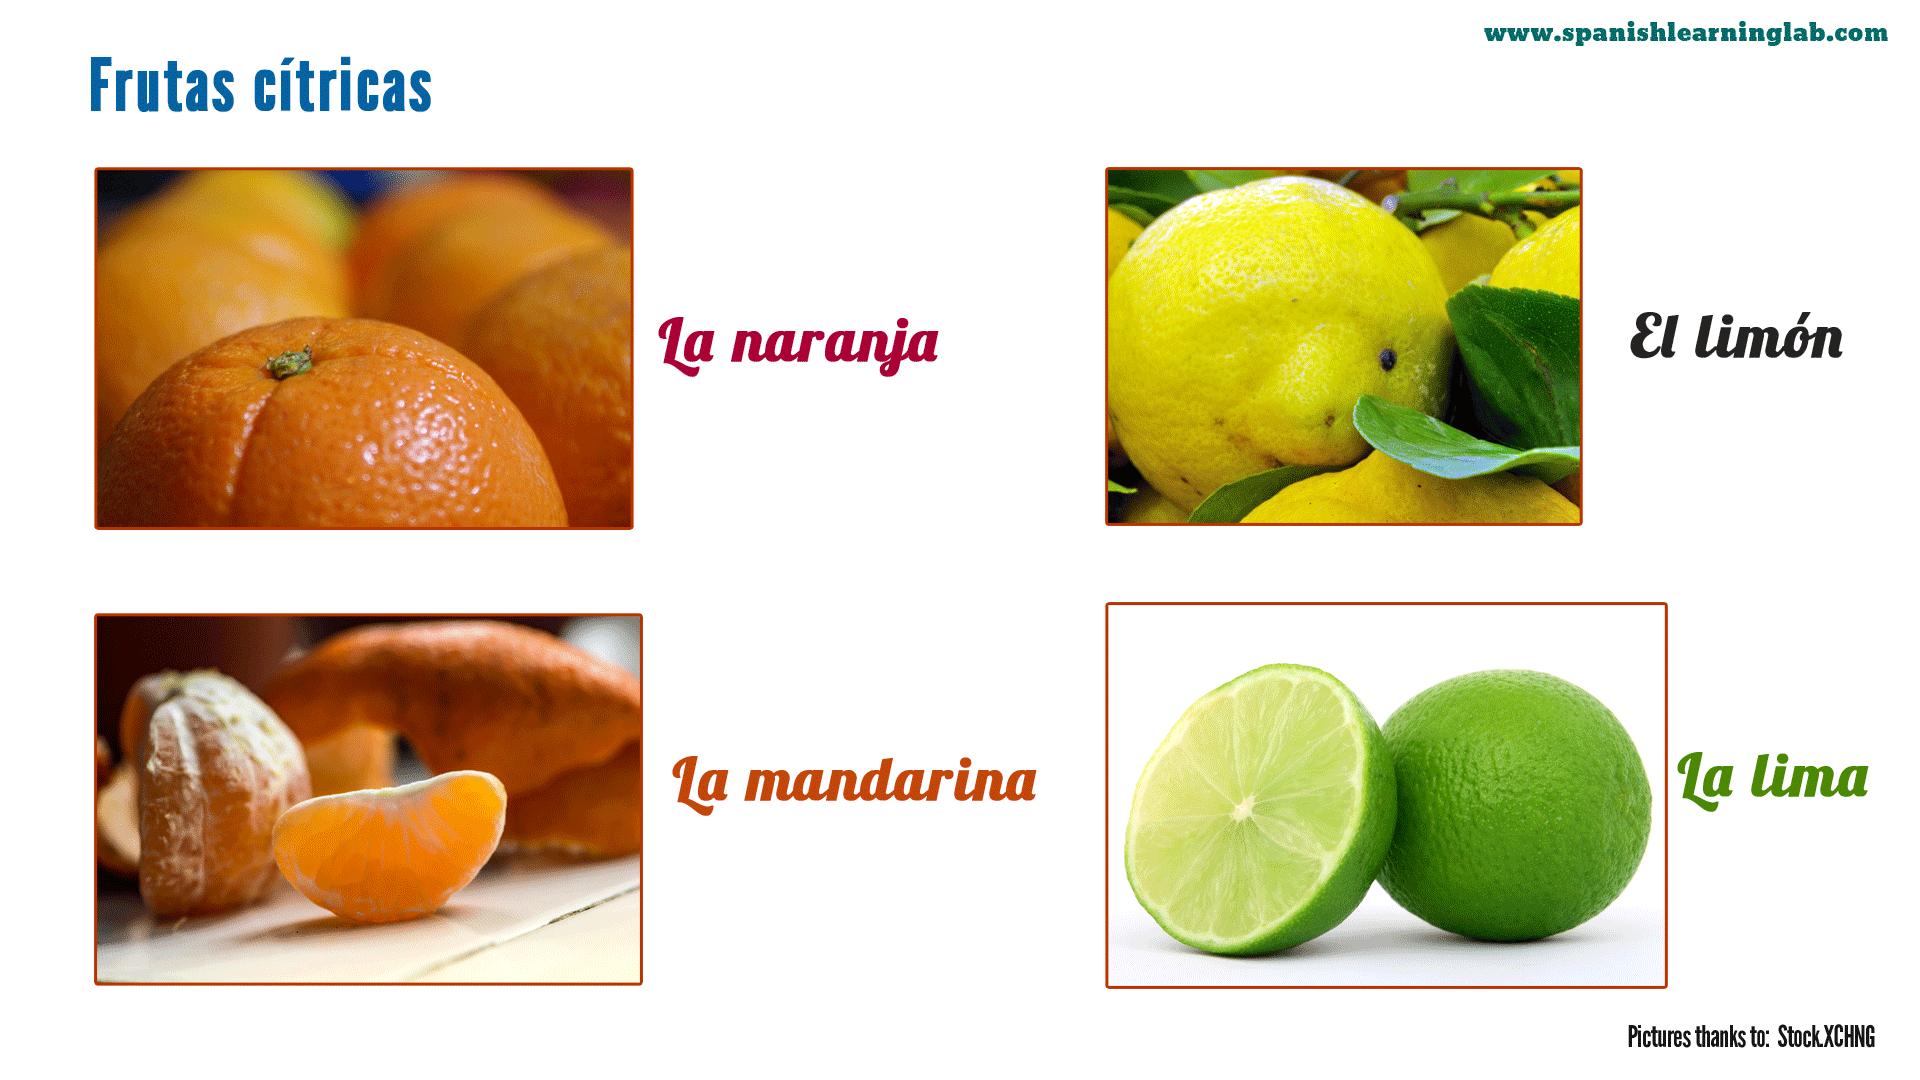 Some Common Names Of Citrus Fruits In Spanish Including La Naranja El Limon La Mandarina Y La